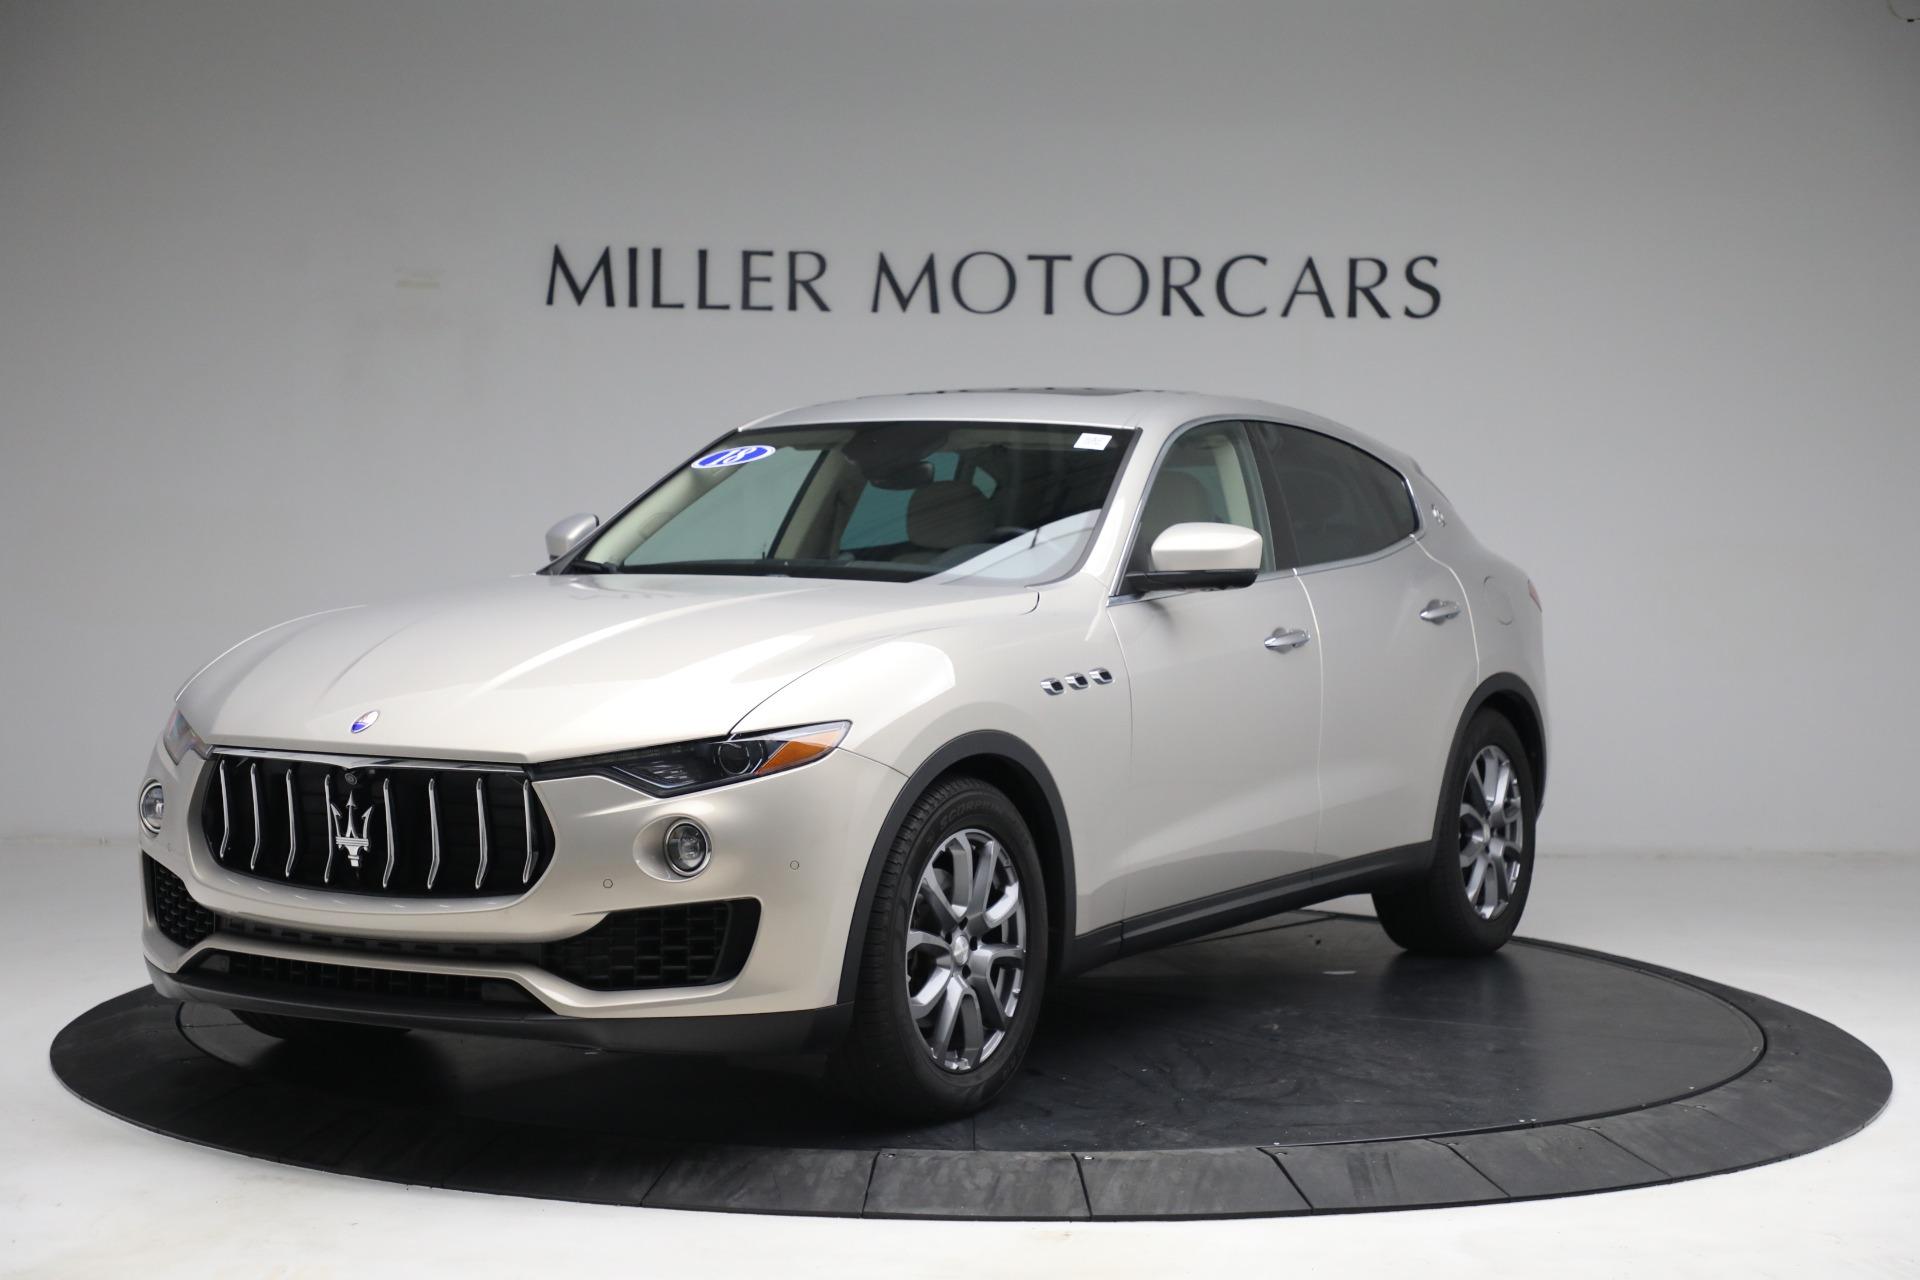 Used 2018 Maserati Levante for sale $57,900 at Pagani of Greenwich in Greenwich CT 06830 1